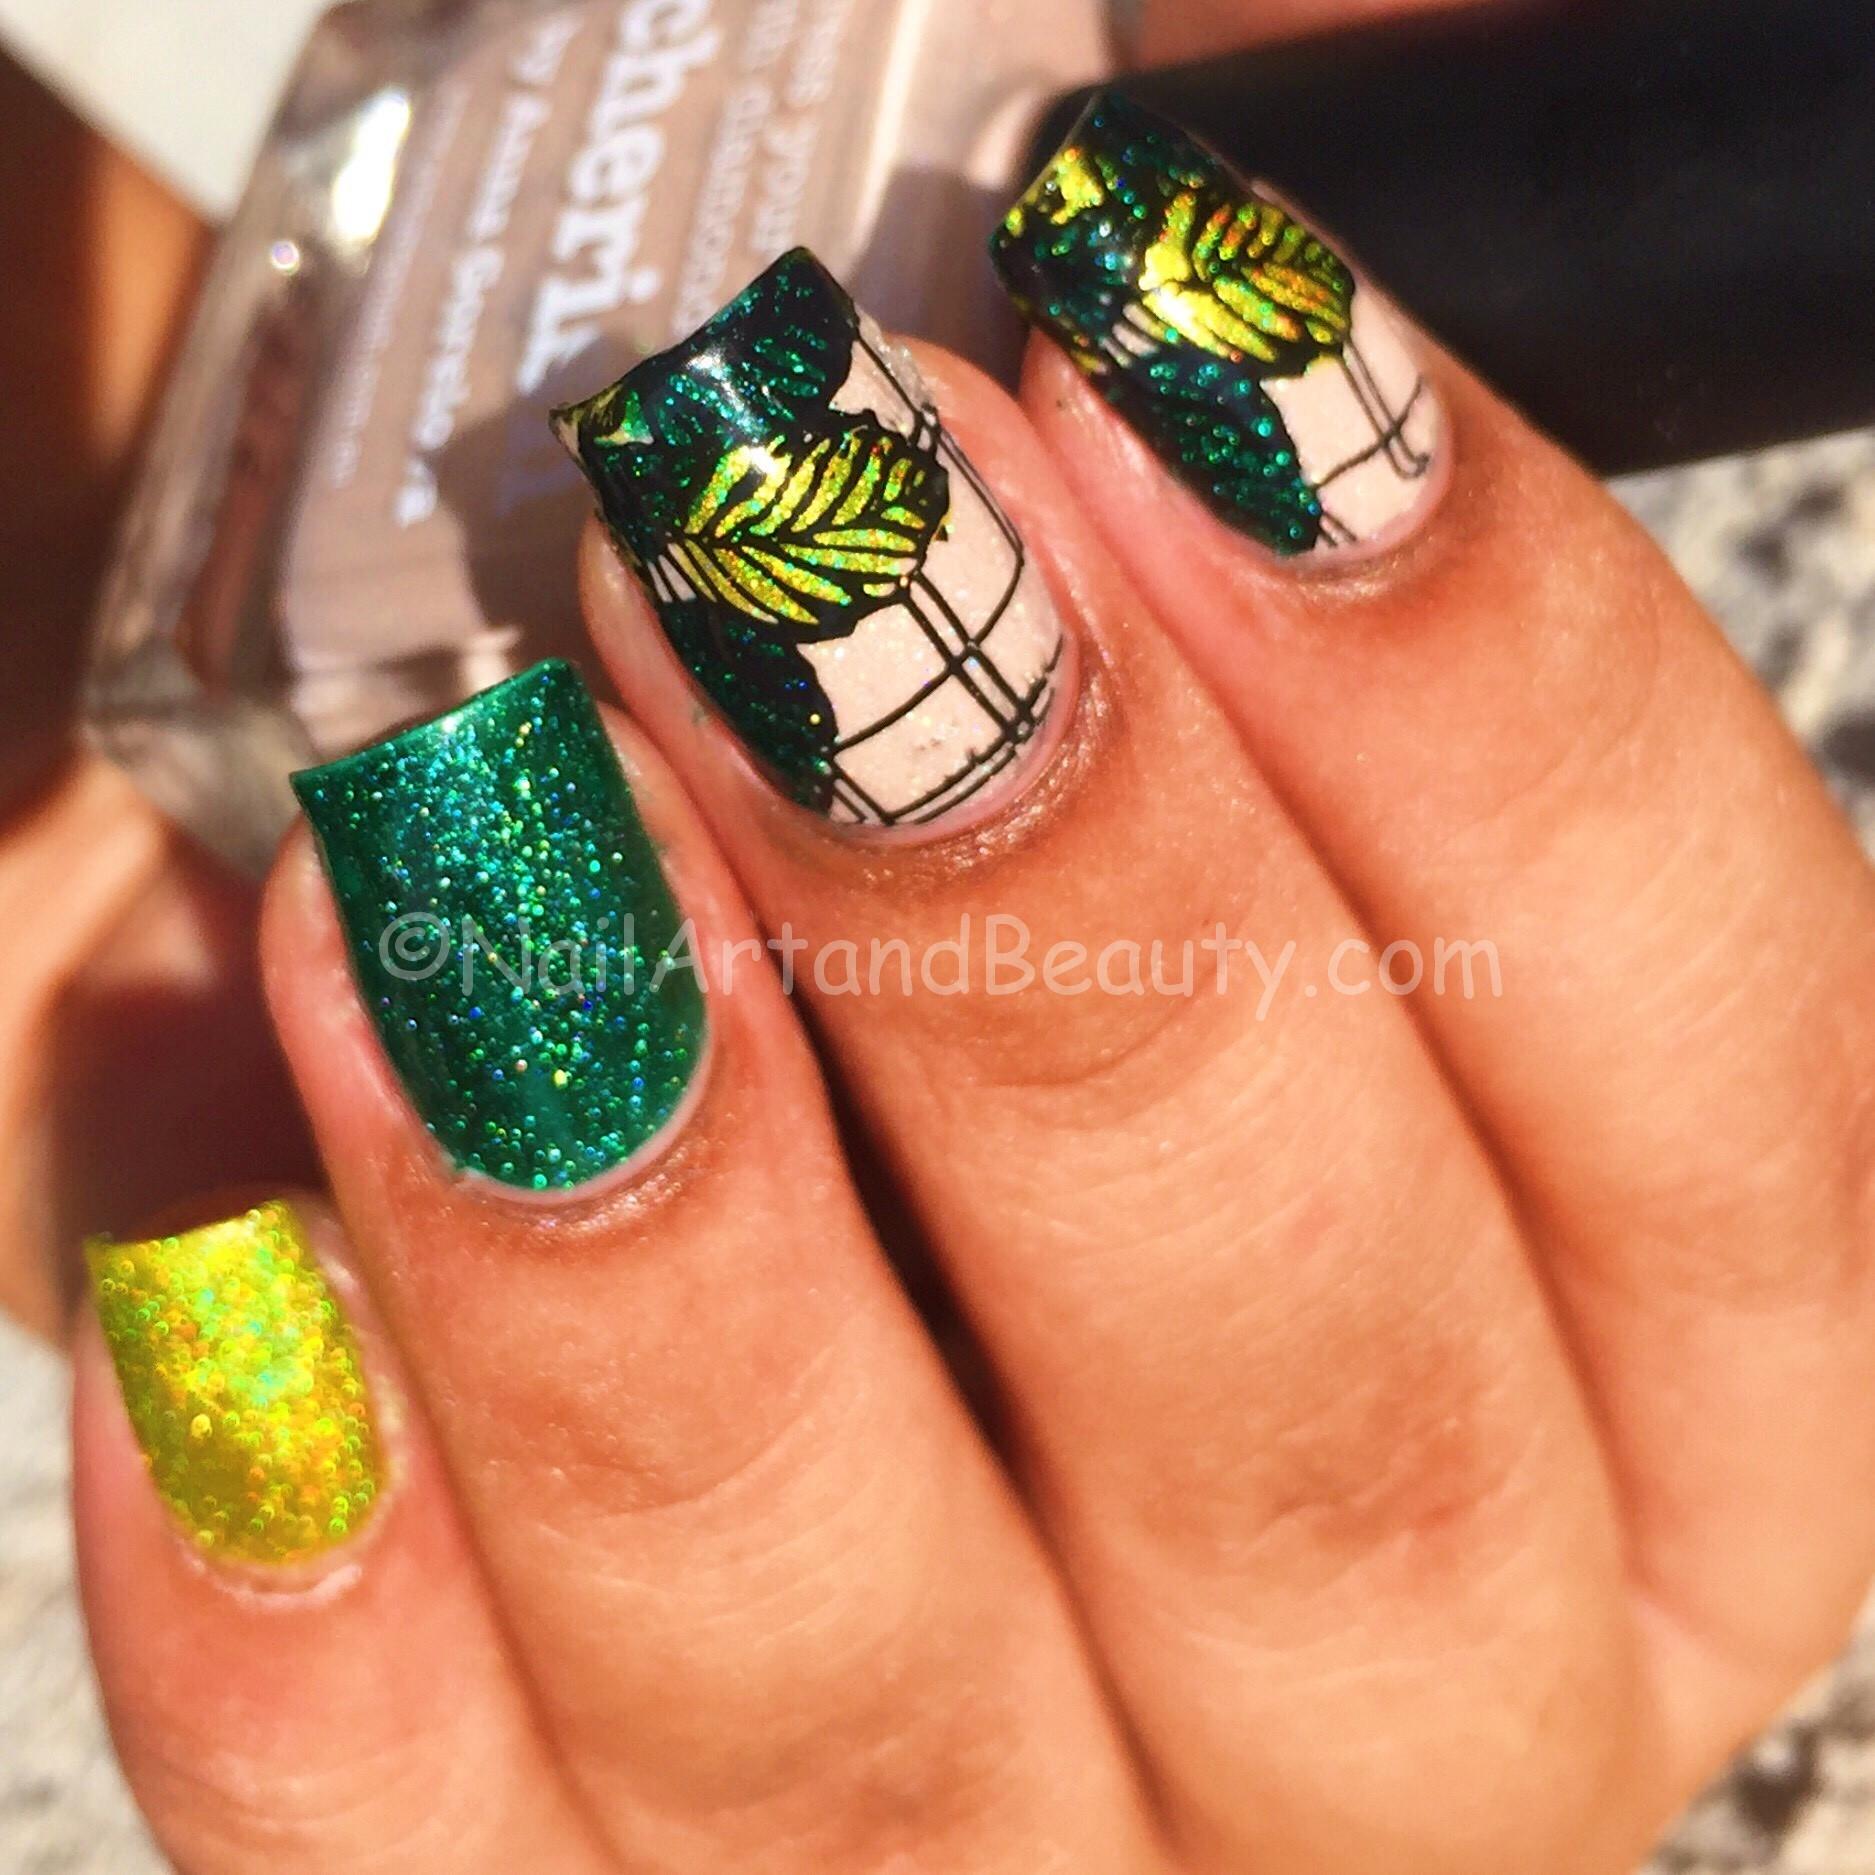 Leafy Holo Nails